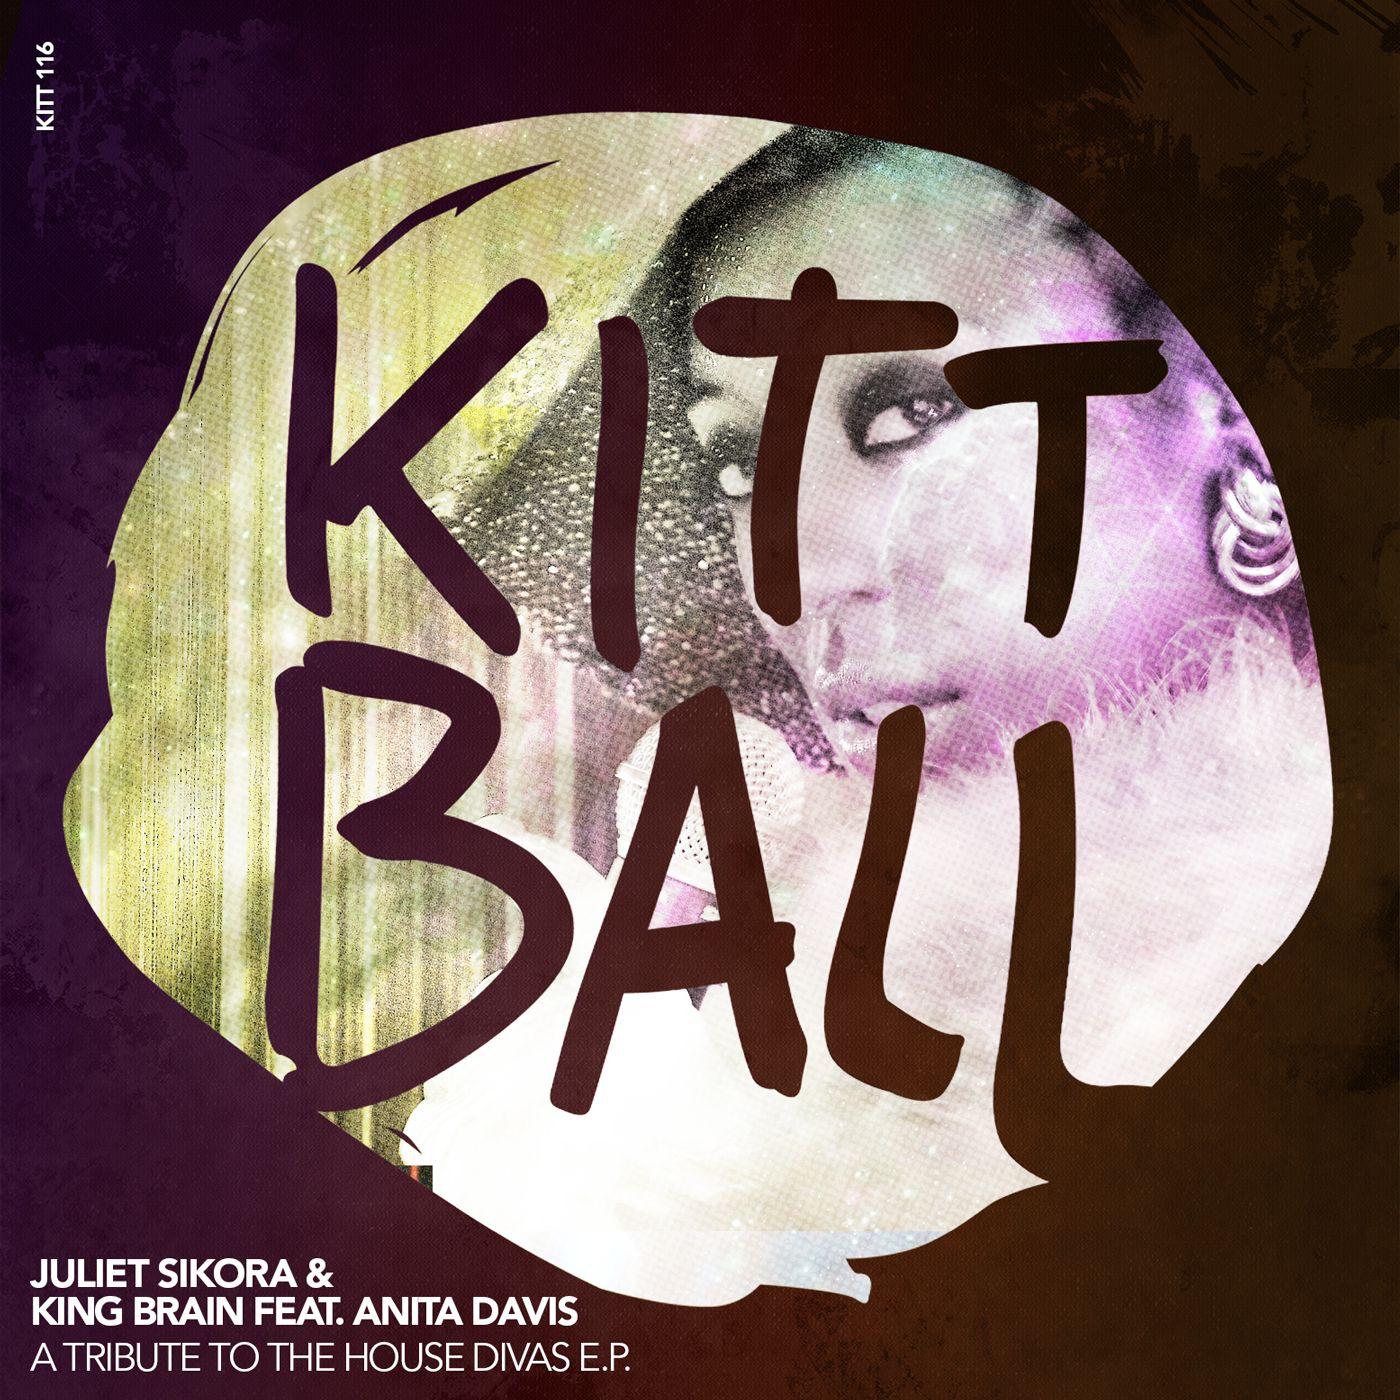 pack_shot_juliet_sikora_king_brain_-_a_tribute_to_the_house_divas_ep_-_kittball_records.jpg